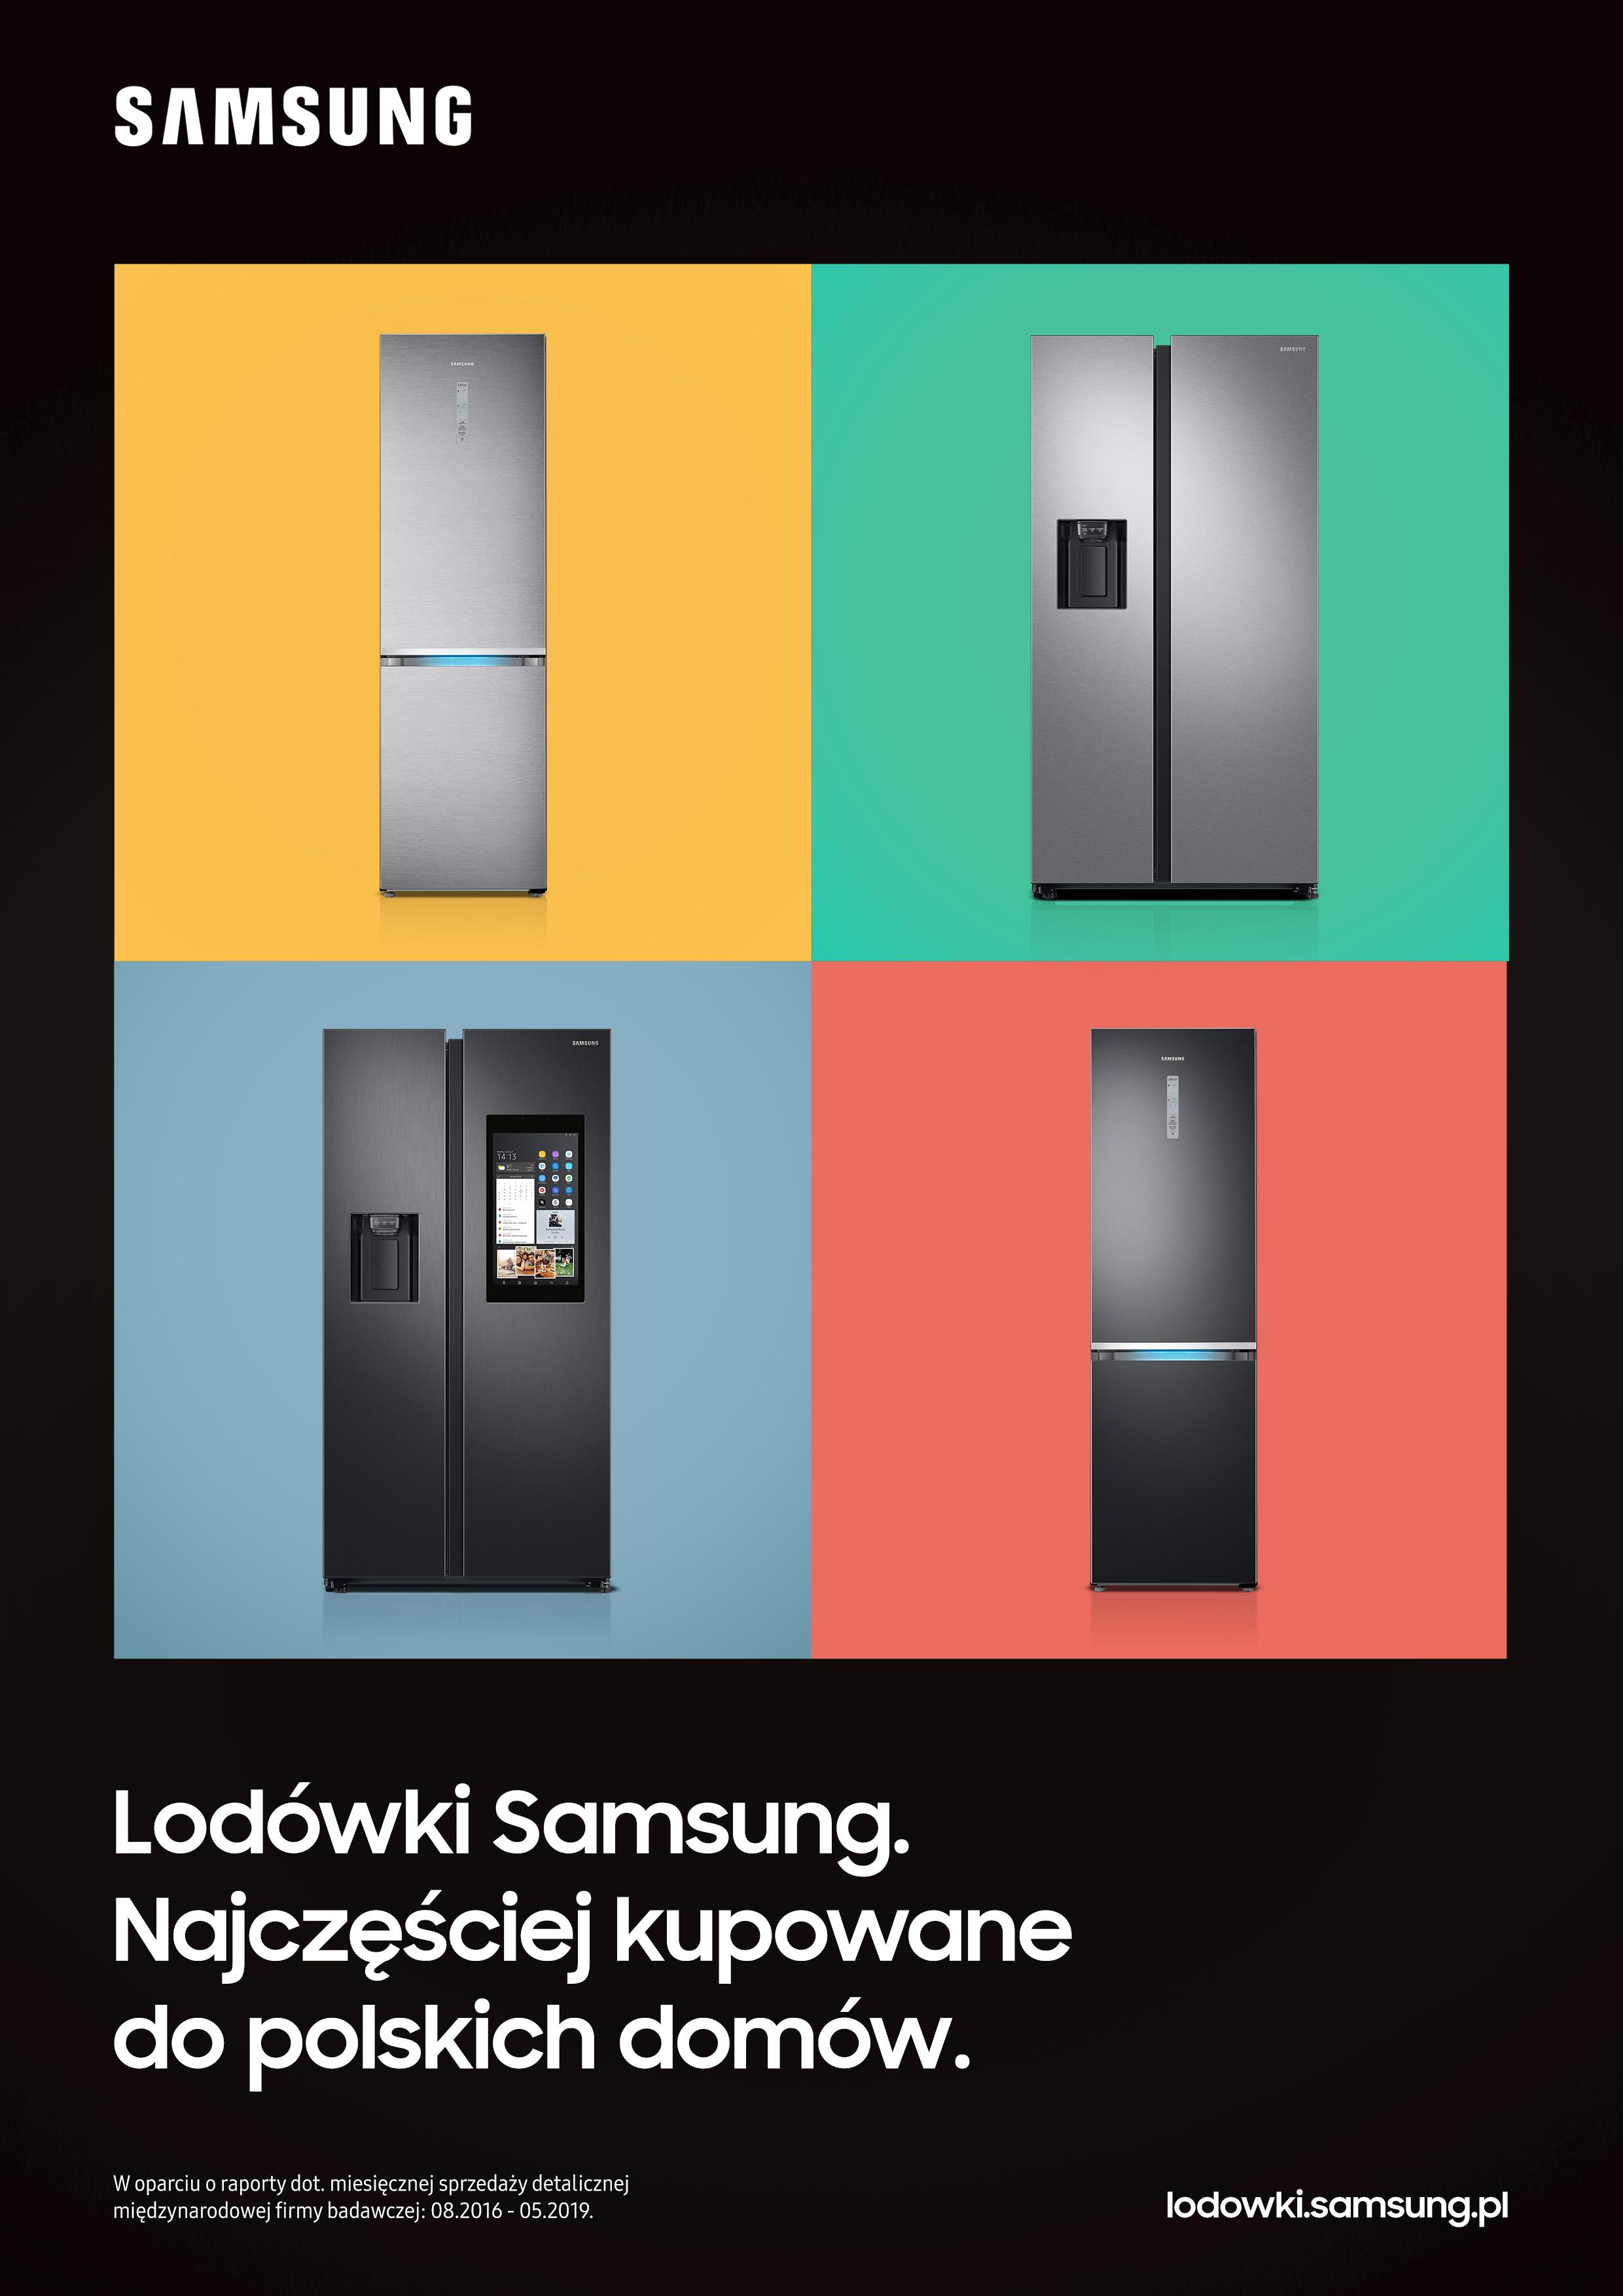 Samsung_lodówki_kampania